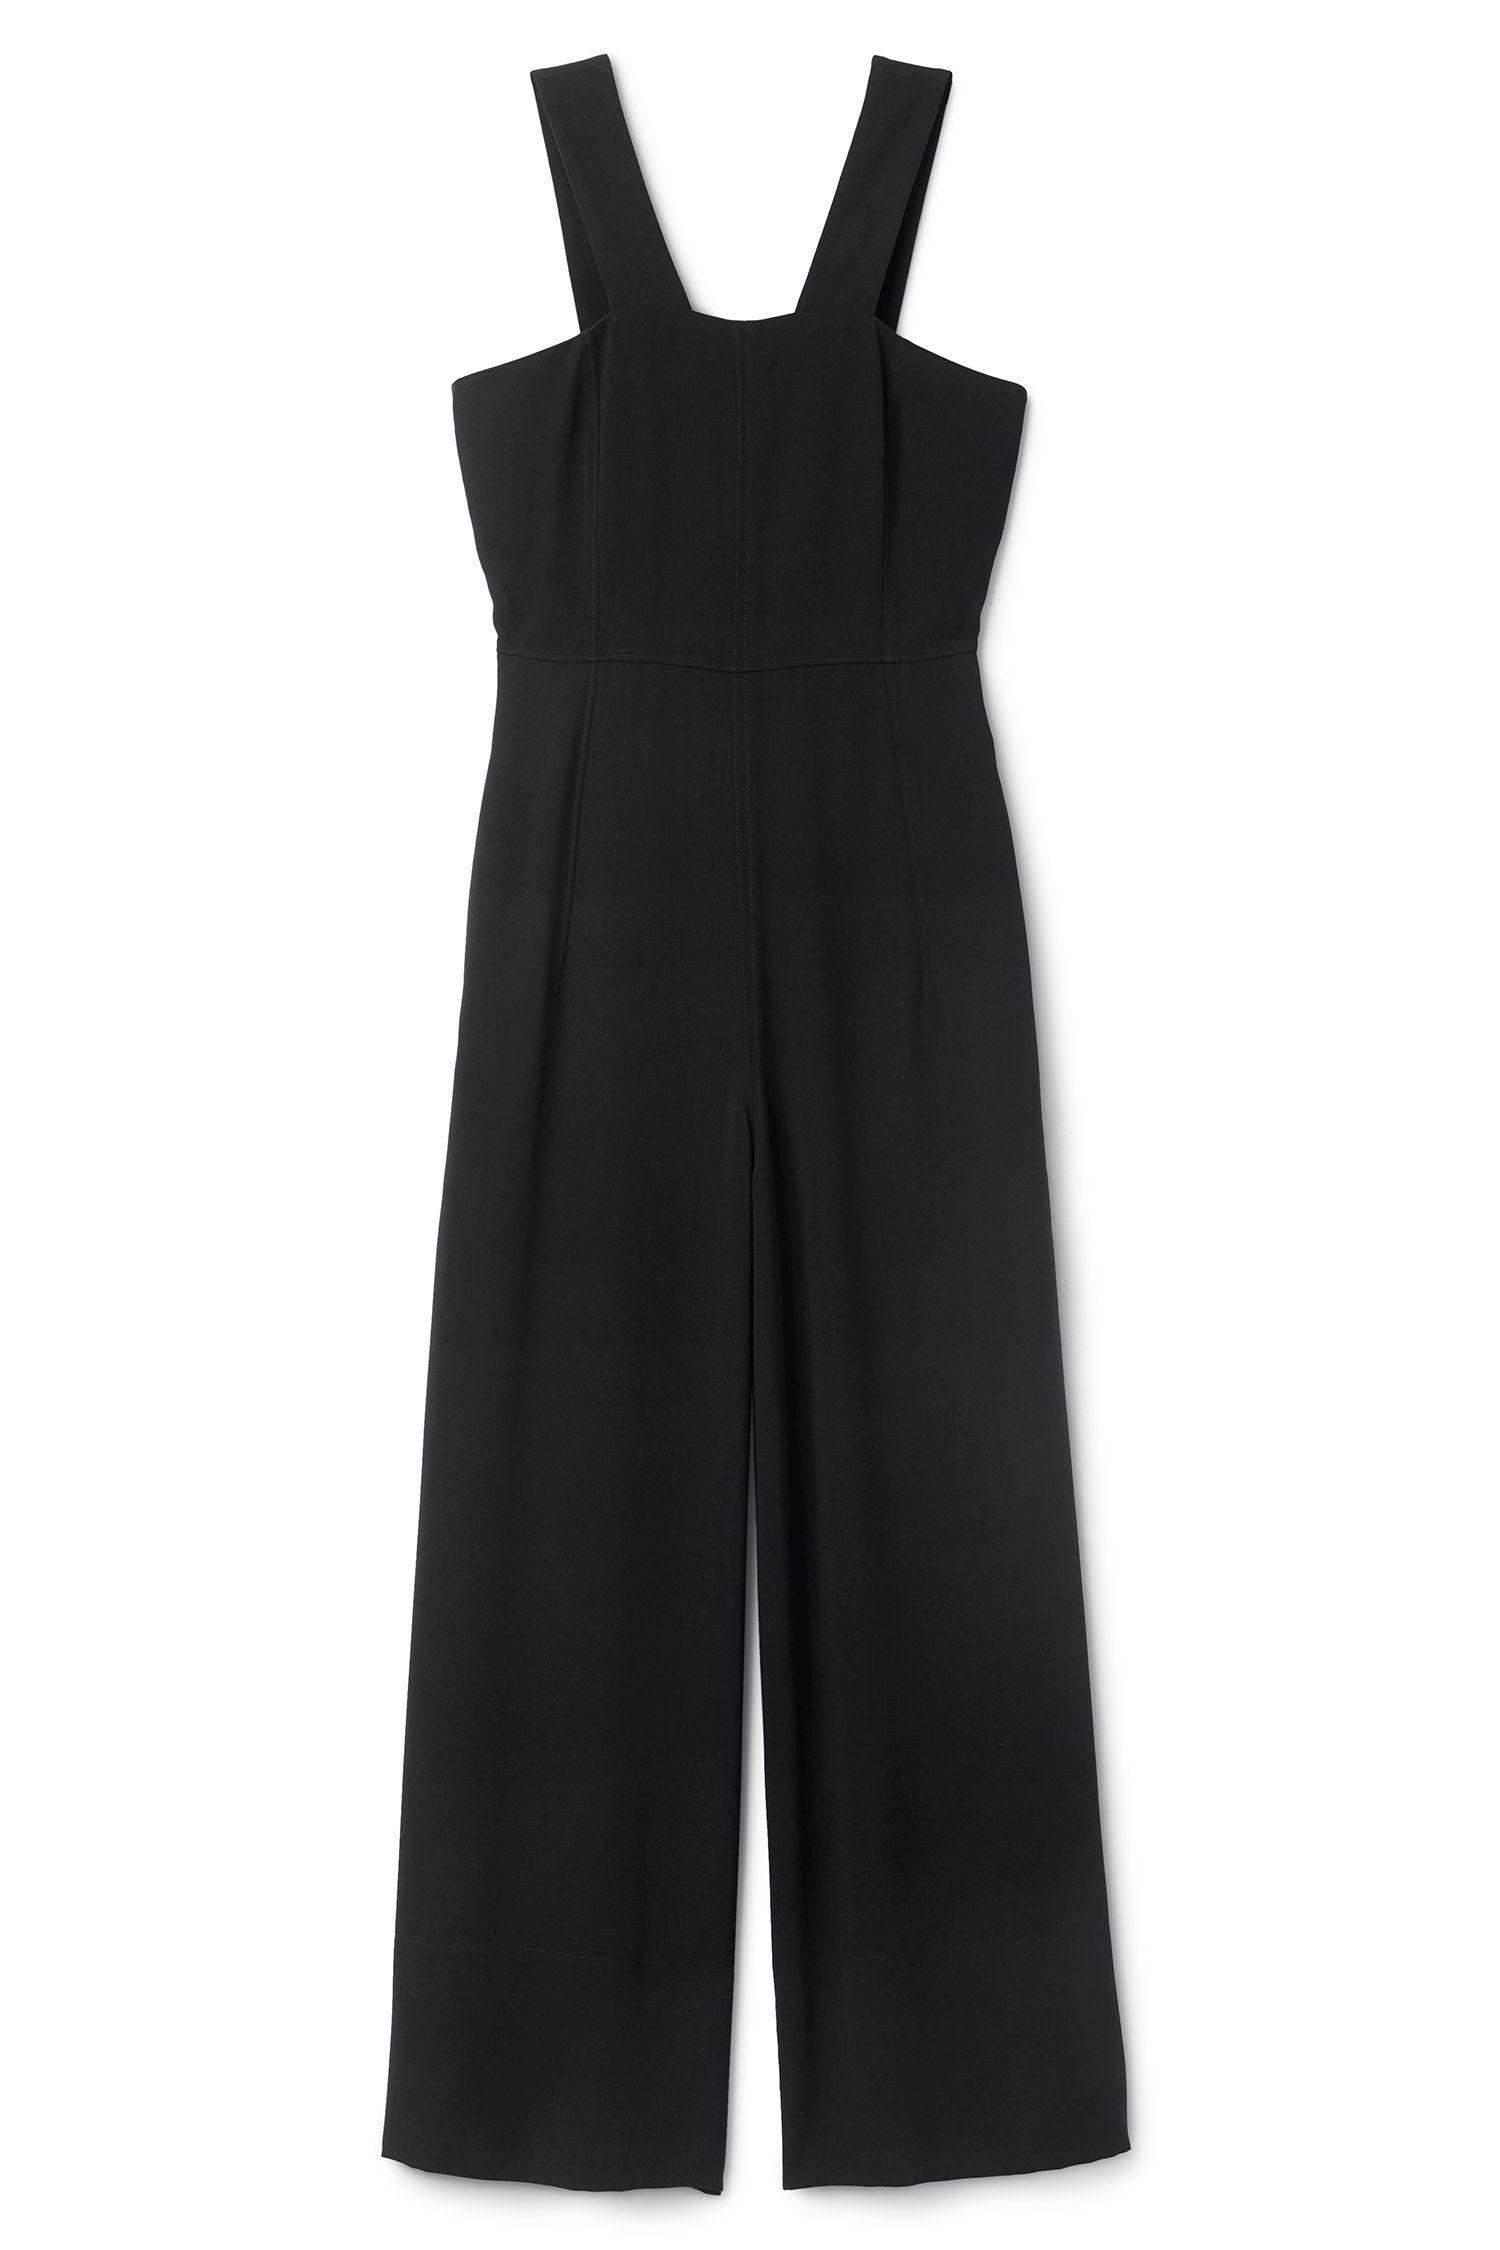 Cyan Jumpsuit - Black - Dresses & Jumpsuits - Weekday